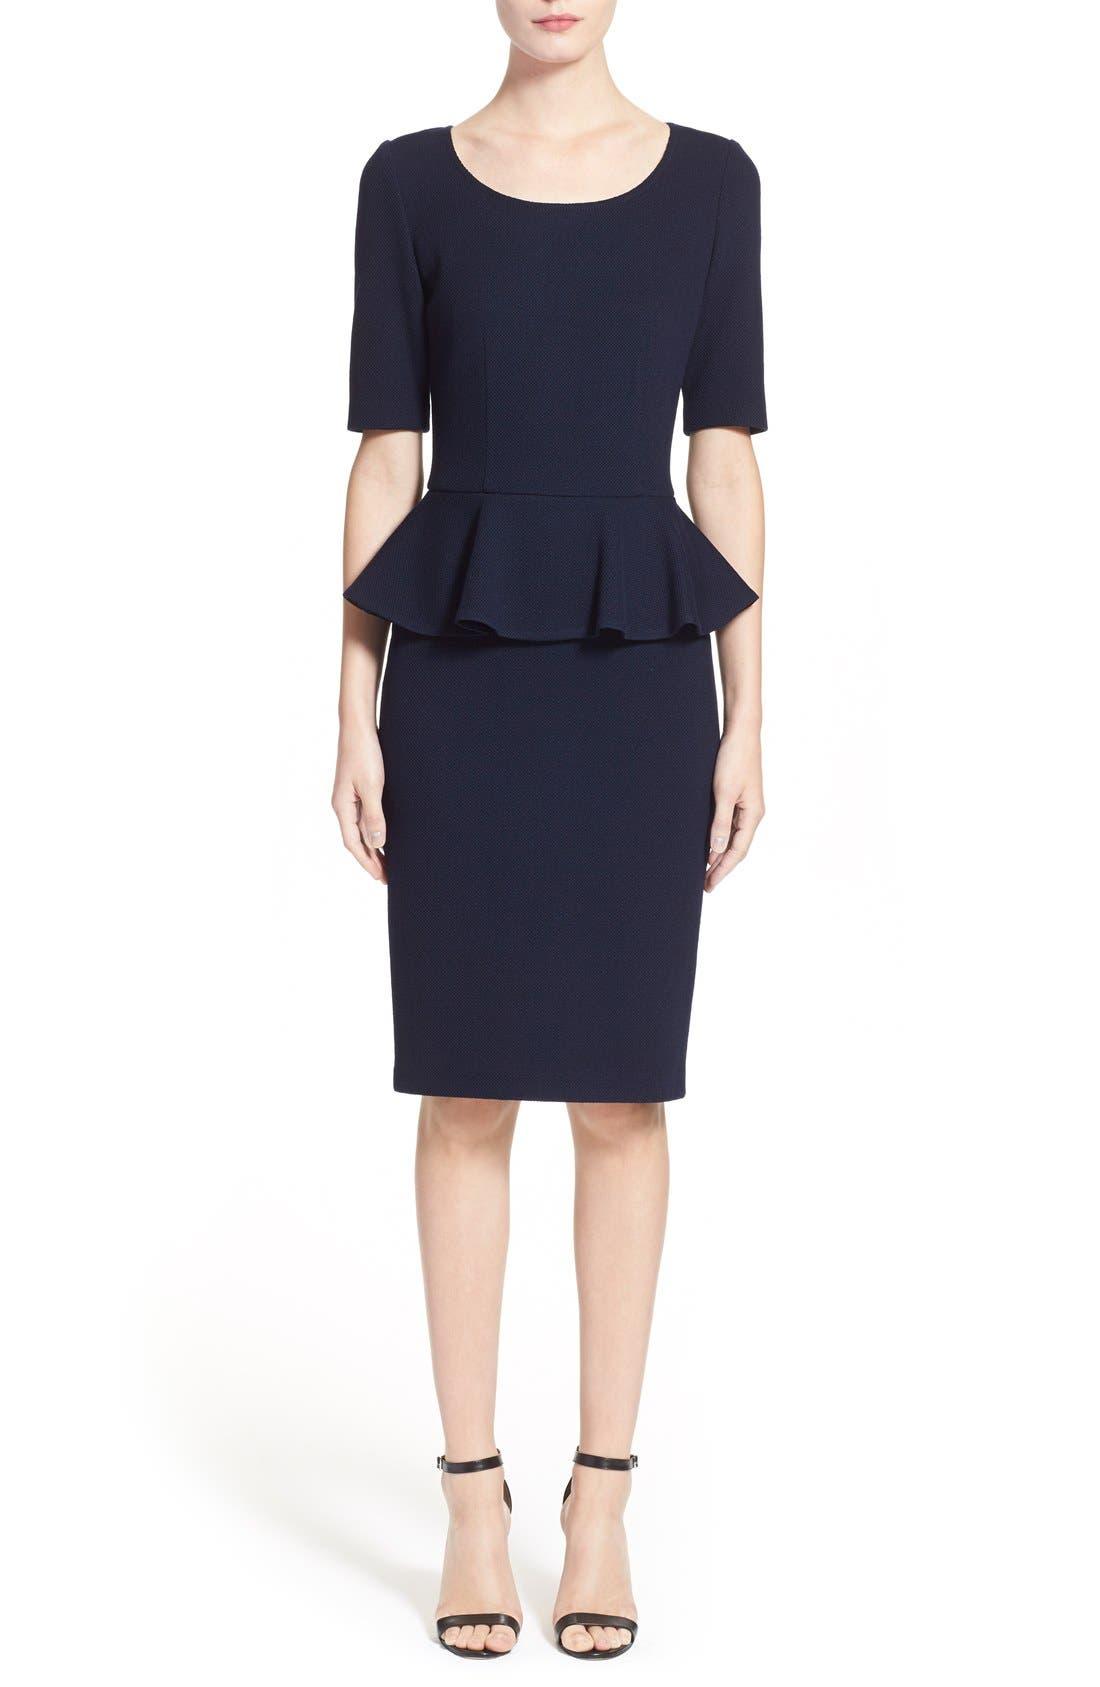 Alternate Image 1 Selected - St. John Collection Peplum Milano Piqué Knit Dress